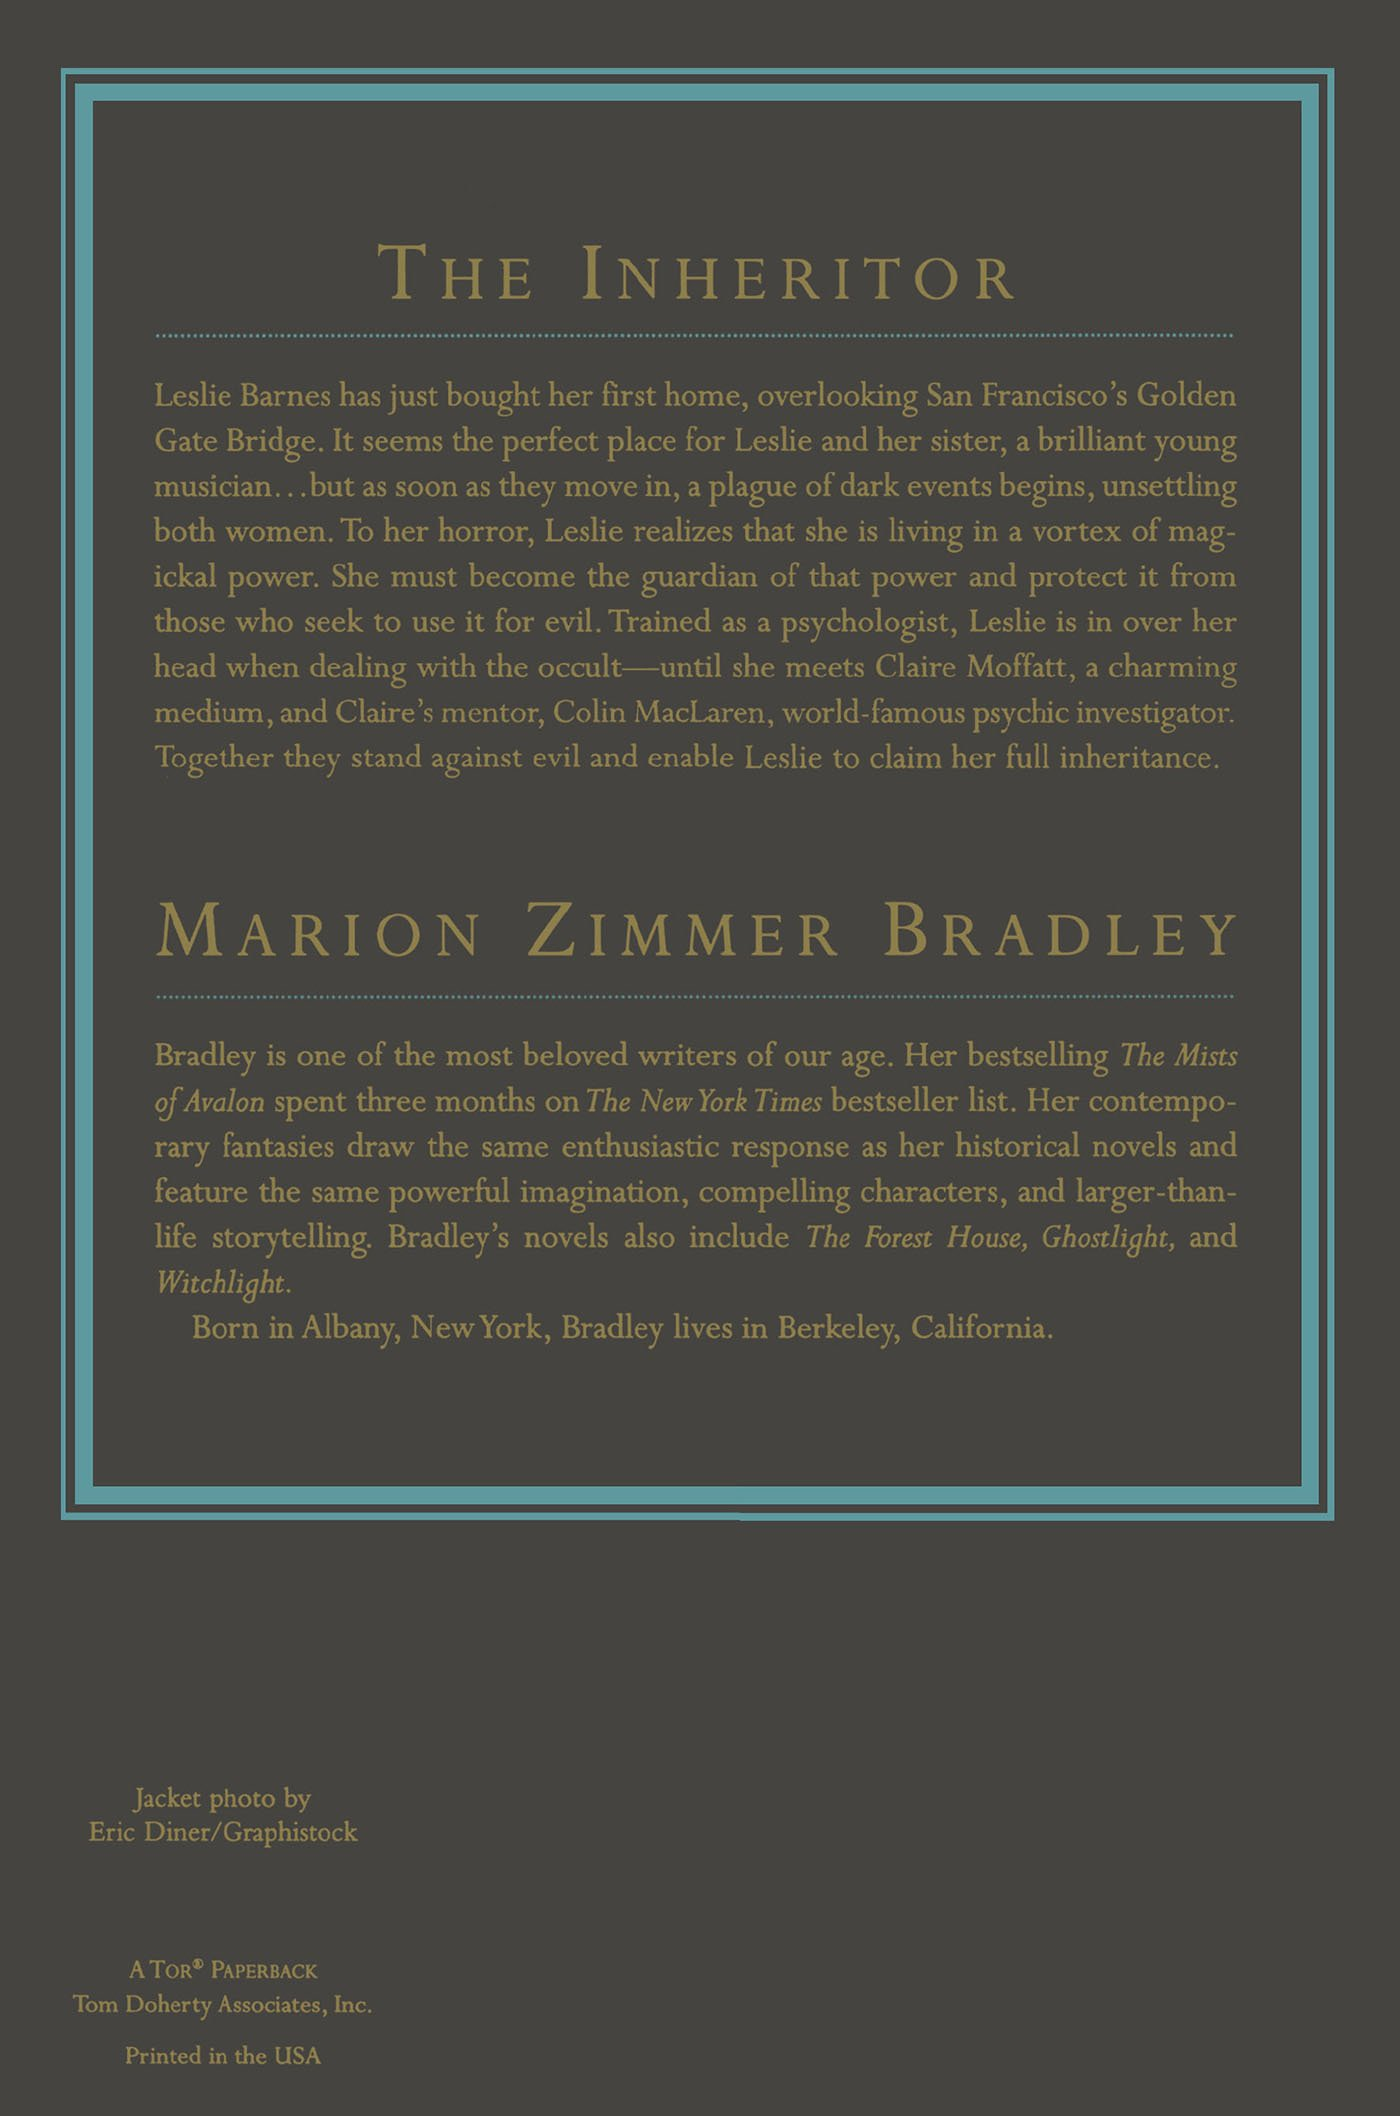 the inheritor marion zimmer bradley 9780312862930 amazon com books